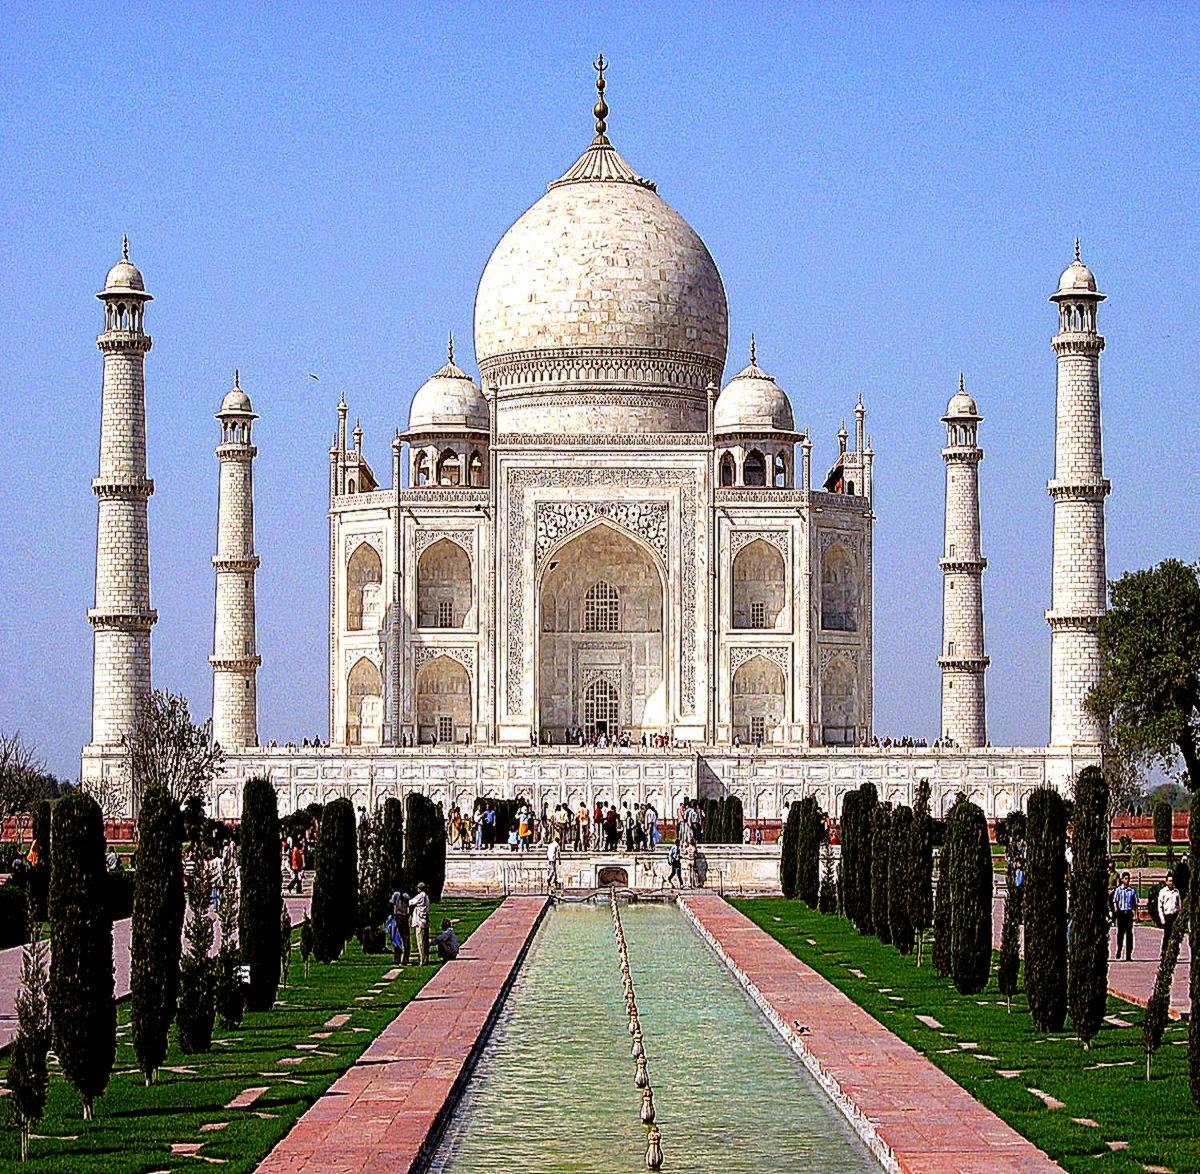 Taj mahal agra india desktop wallpapers hd background - Taj mahal background hd ...